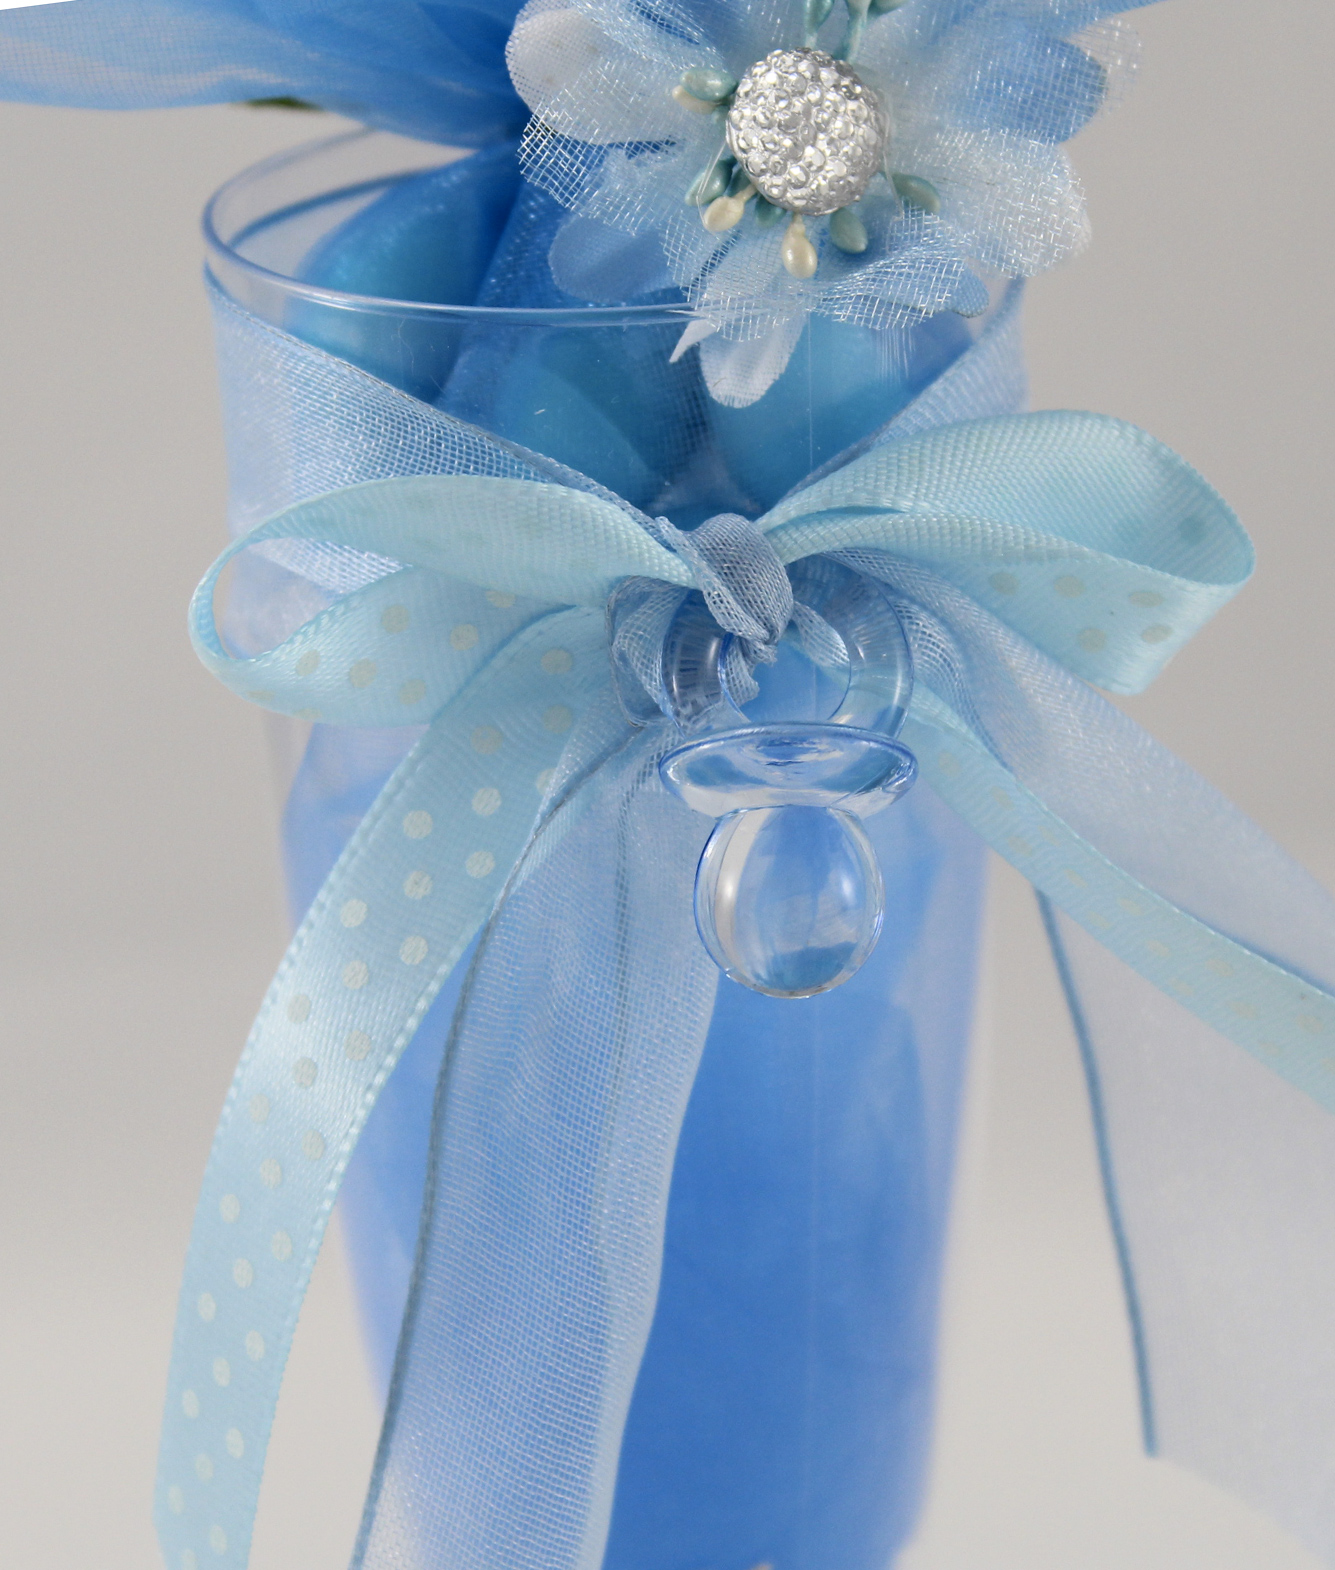 Segnaposto Matrimonio Azzurro : Segnaposto bicchiere bomboniera azzurro nascita